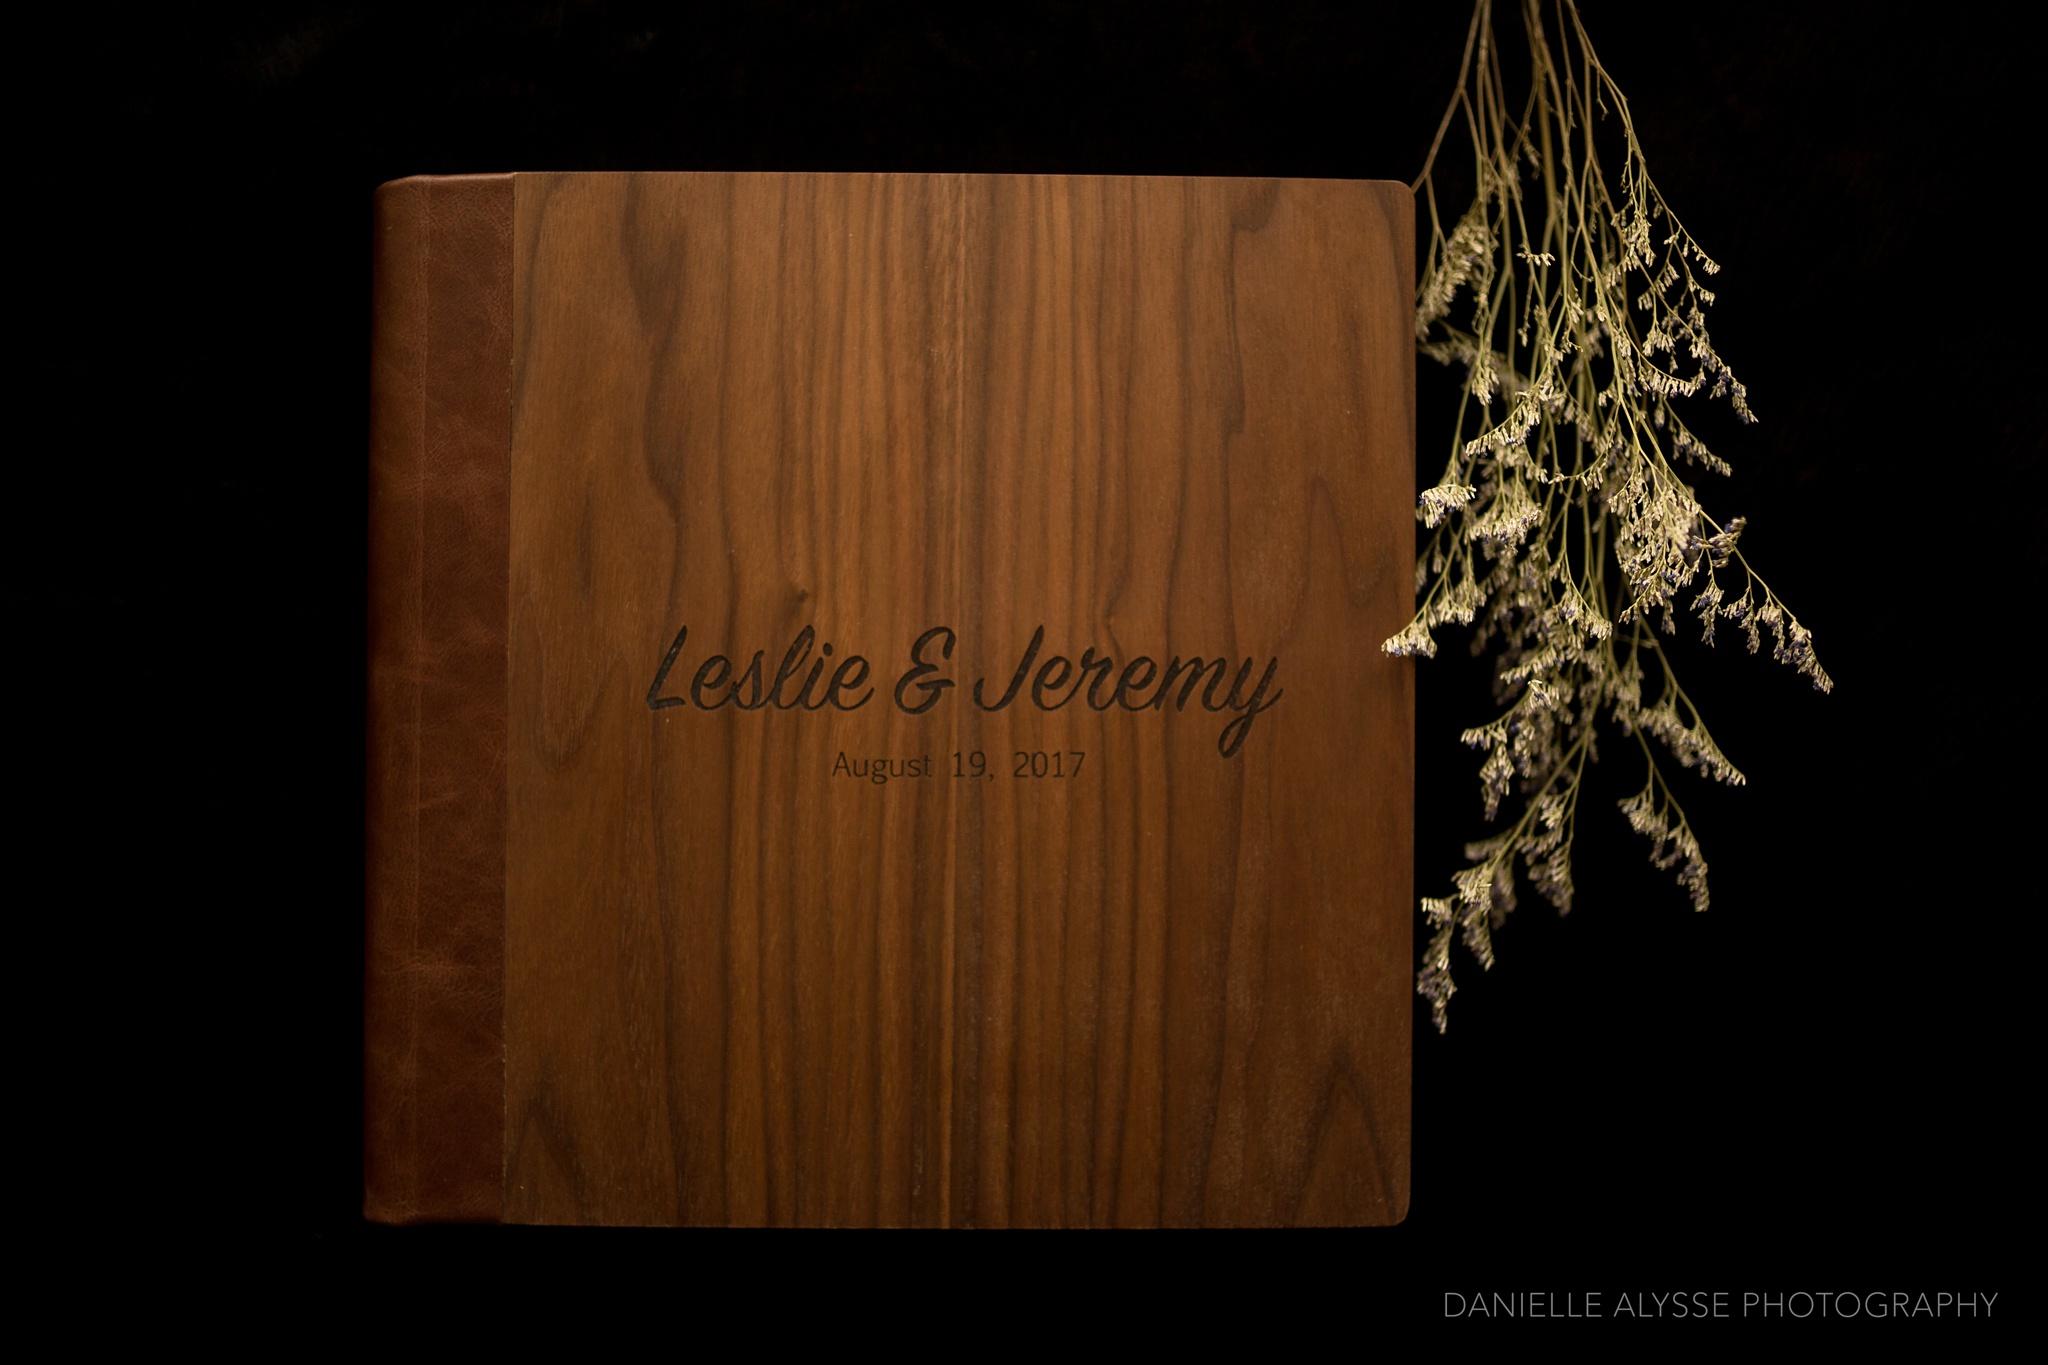 171115_wedding_album_wooden_walnut_leslie_jeremy_bear_valley_lodge_california_danielle_alysse_photography_sacramento_photographer_1_WEB.jpg